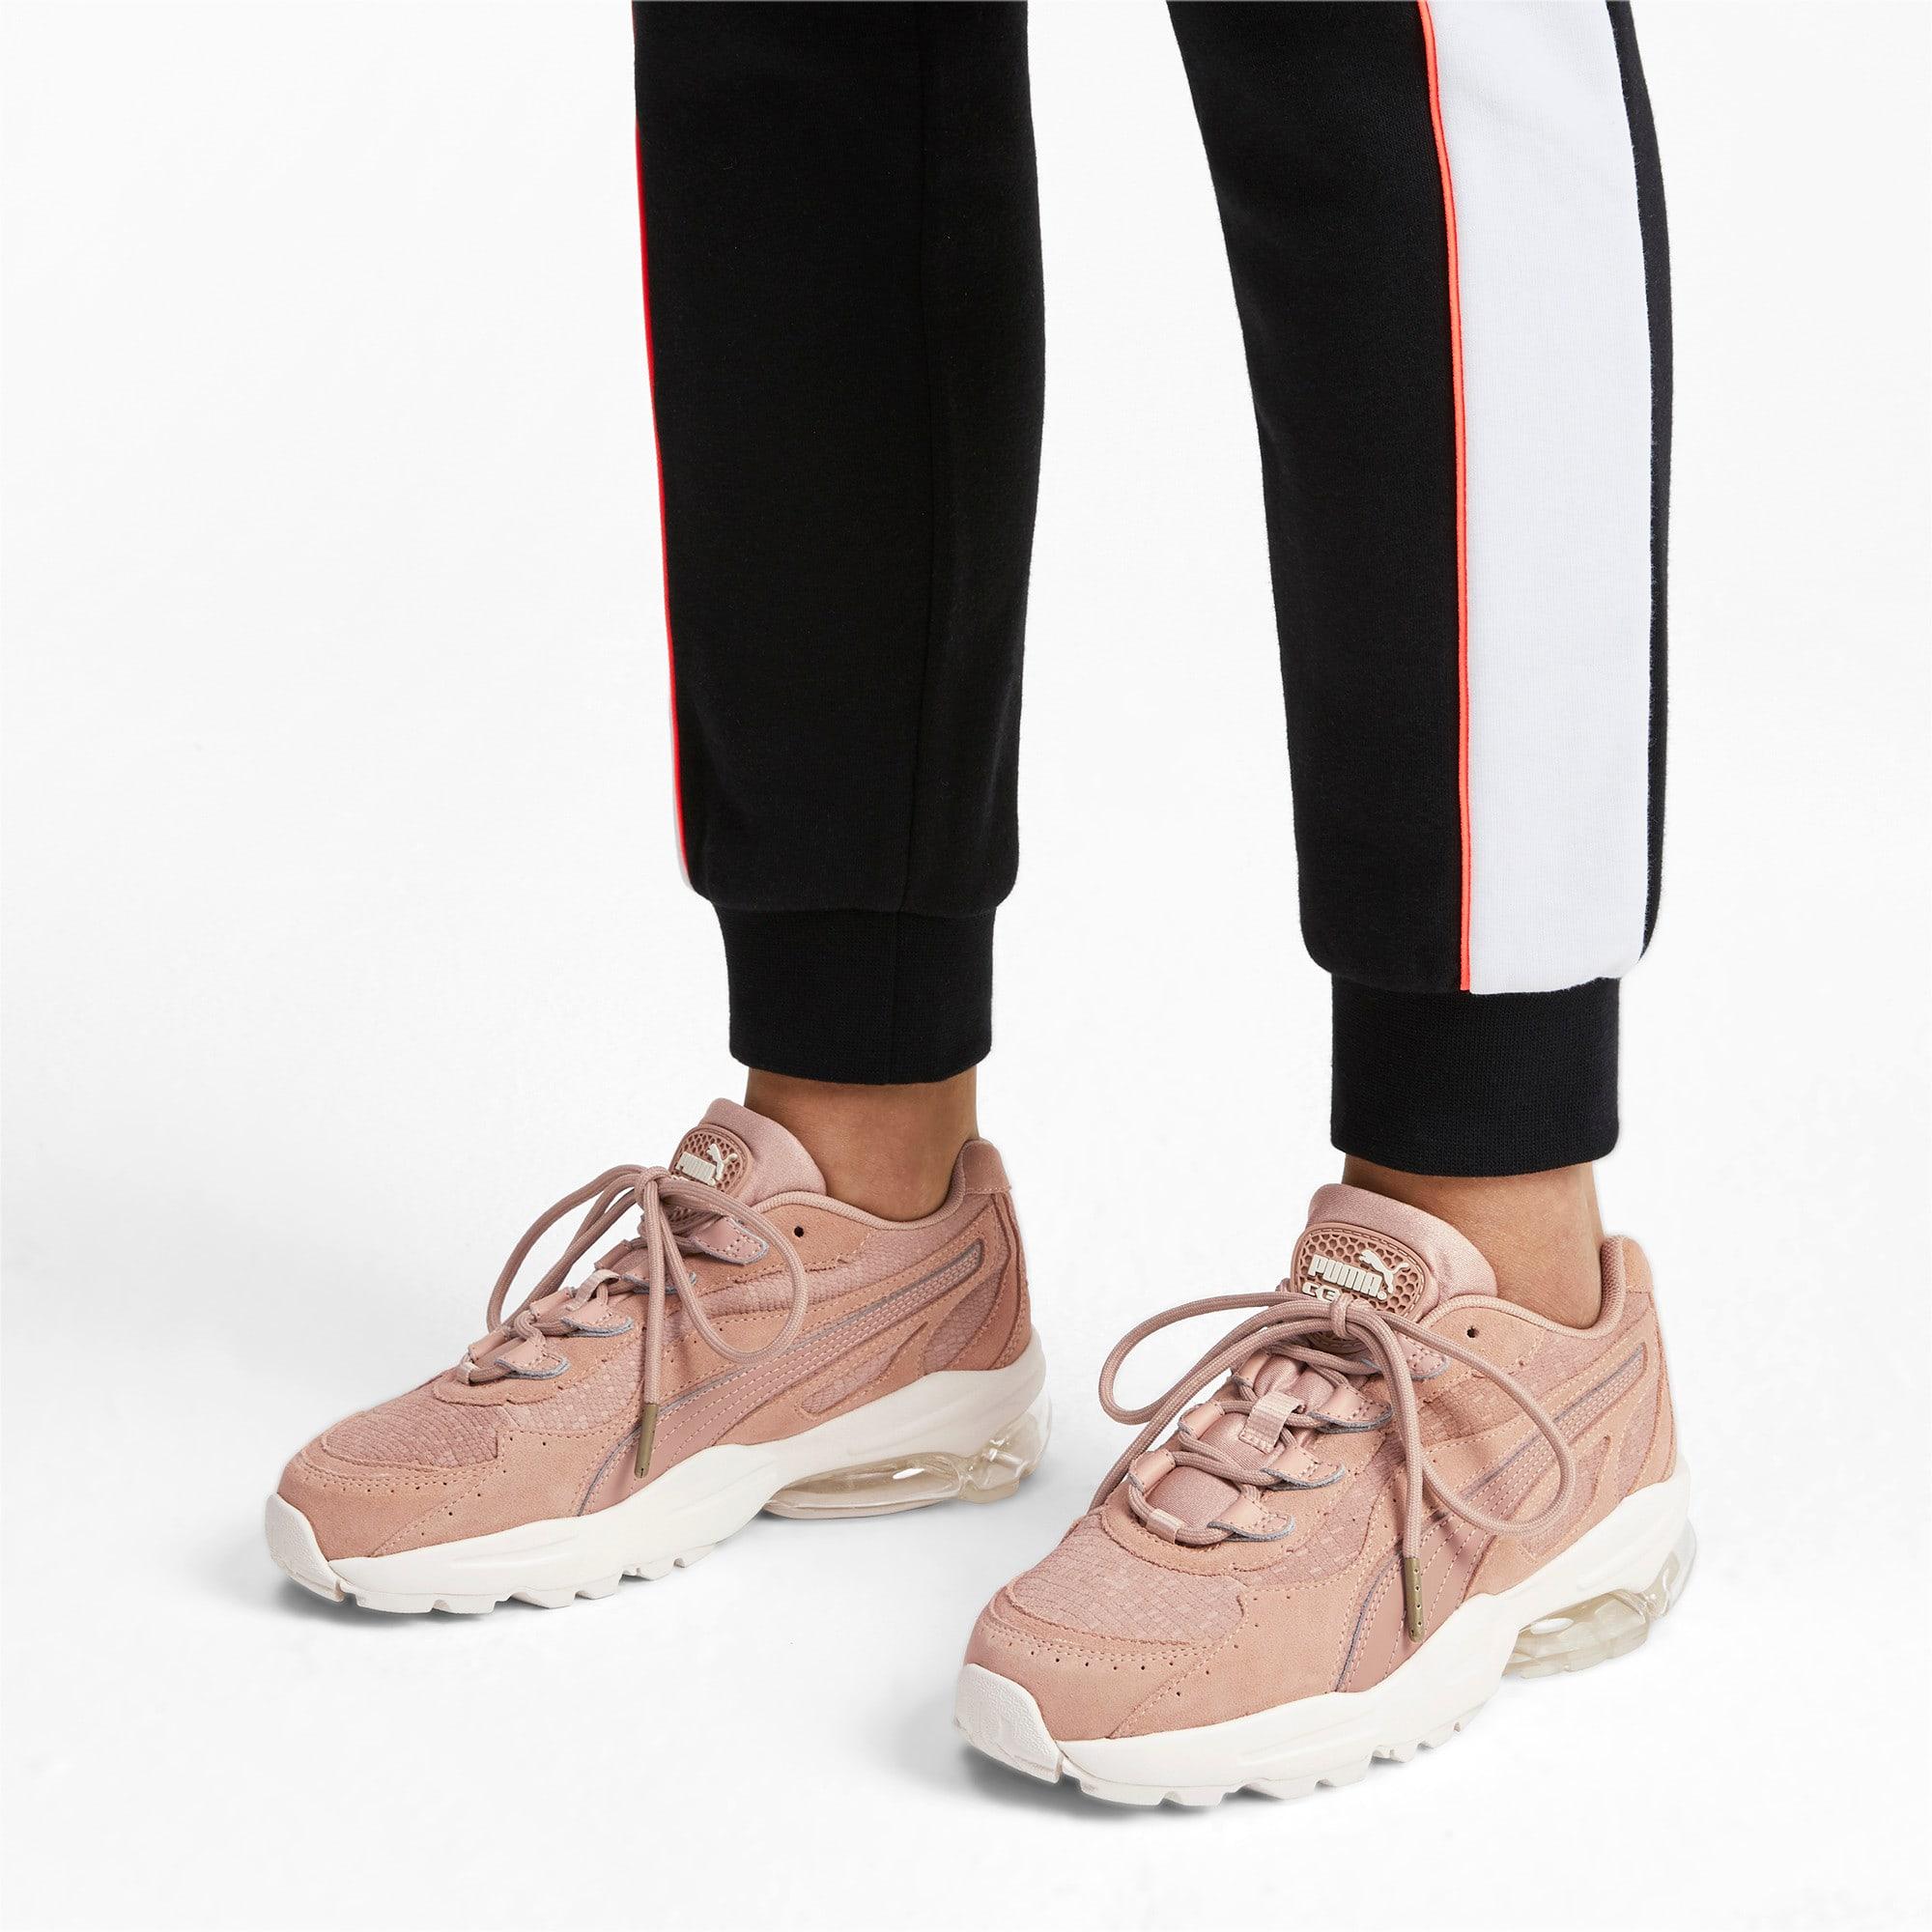 Thumbnail 3 of CELL Stellar Tonal Women's Sneakers, Nougat-Puma Team Gold, medium